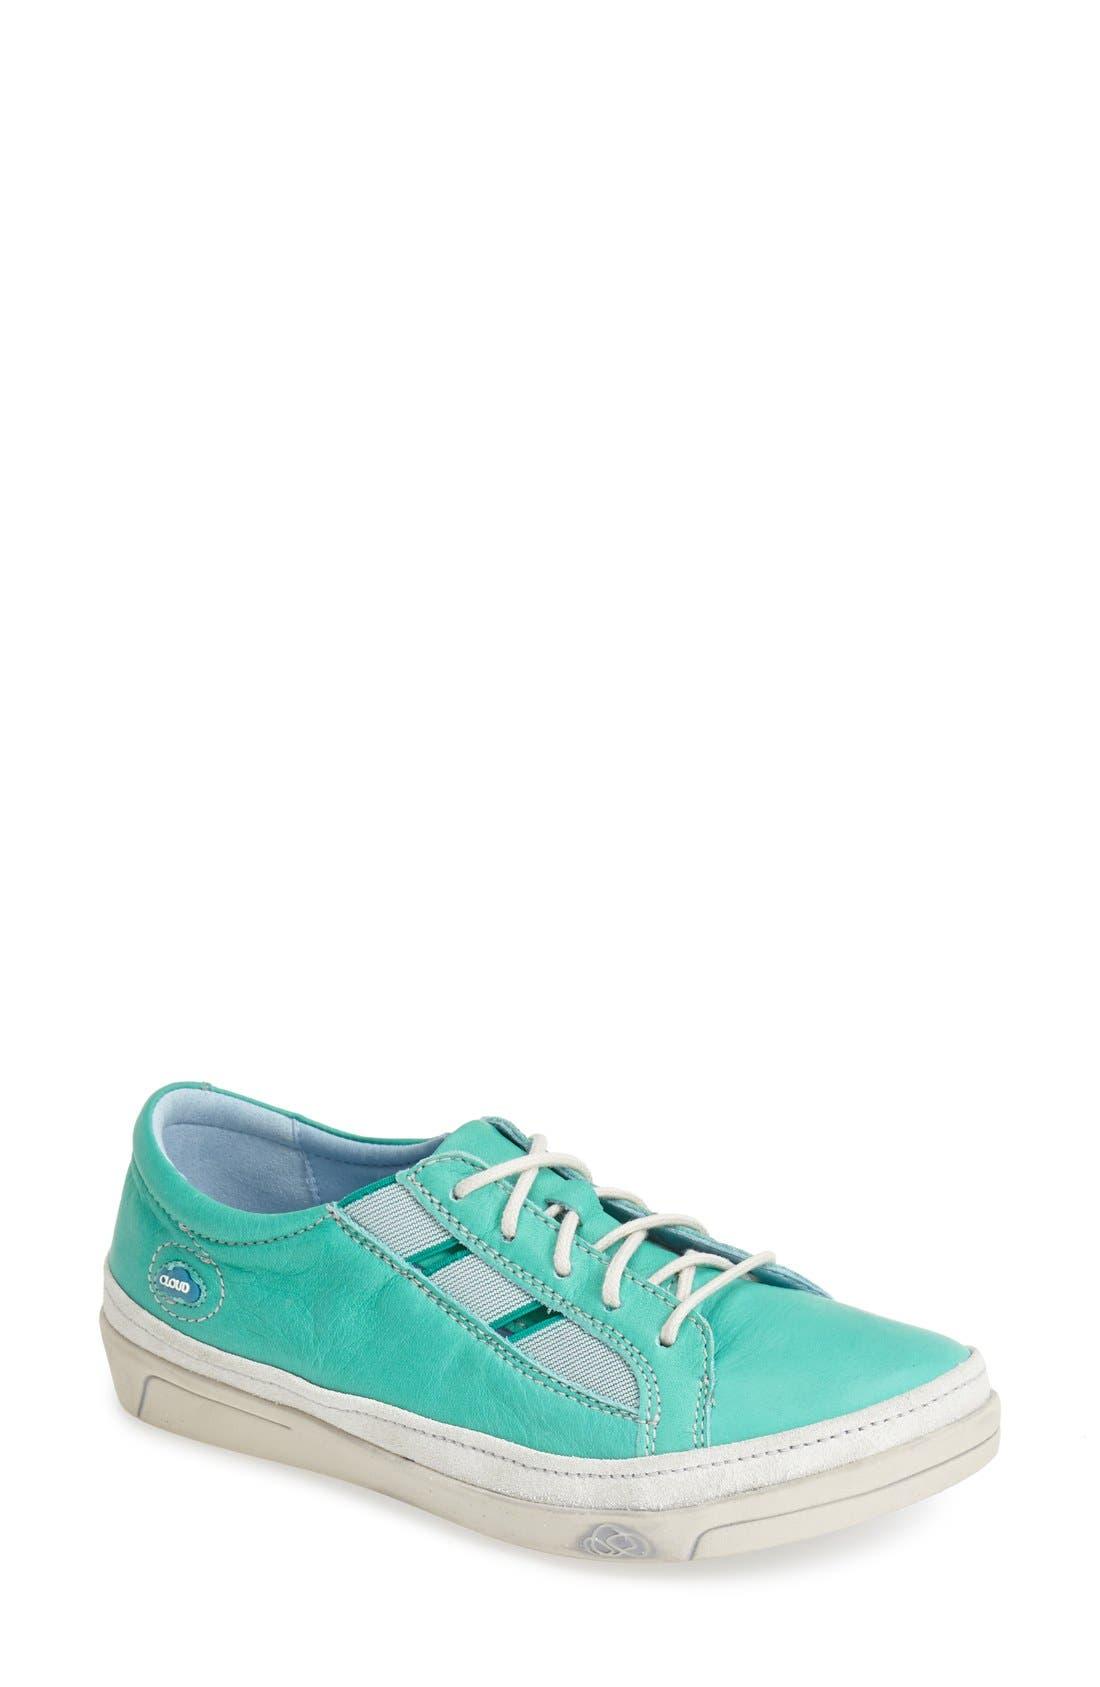 'Amazonas' Leather Sneaker,                             Main thumbnail 1, color,                             GREEN